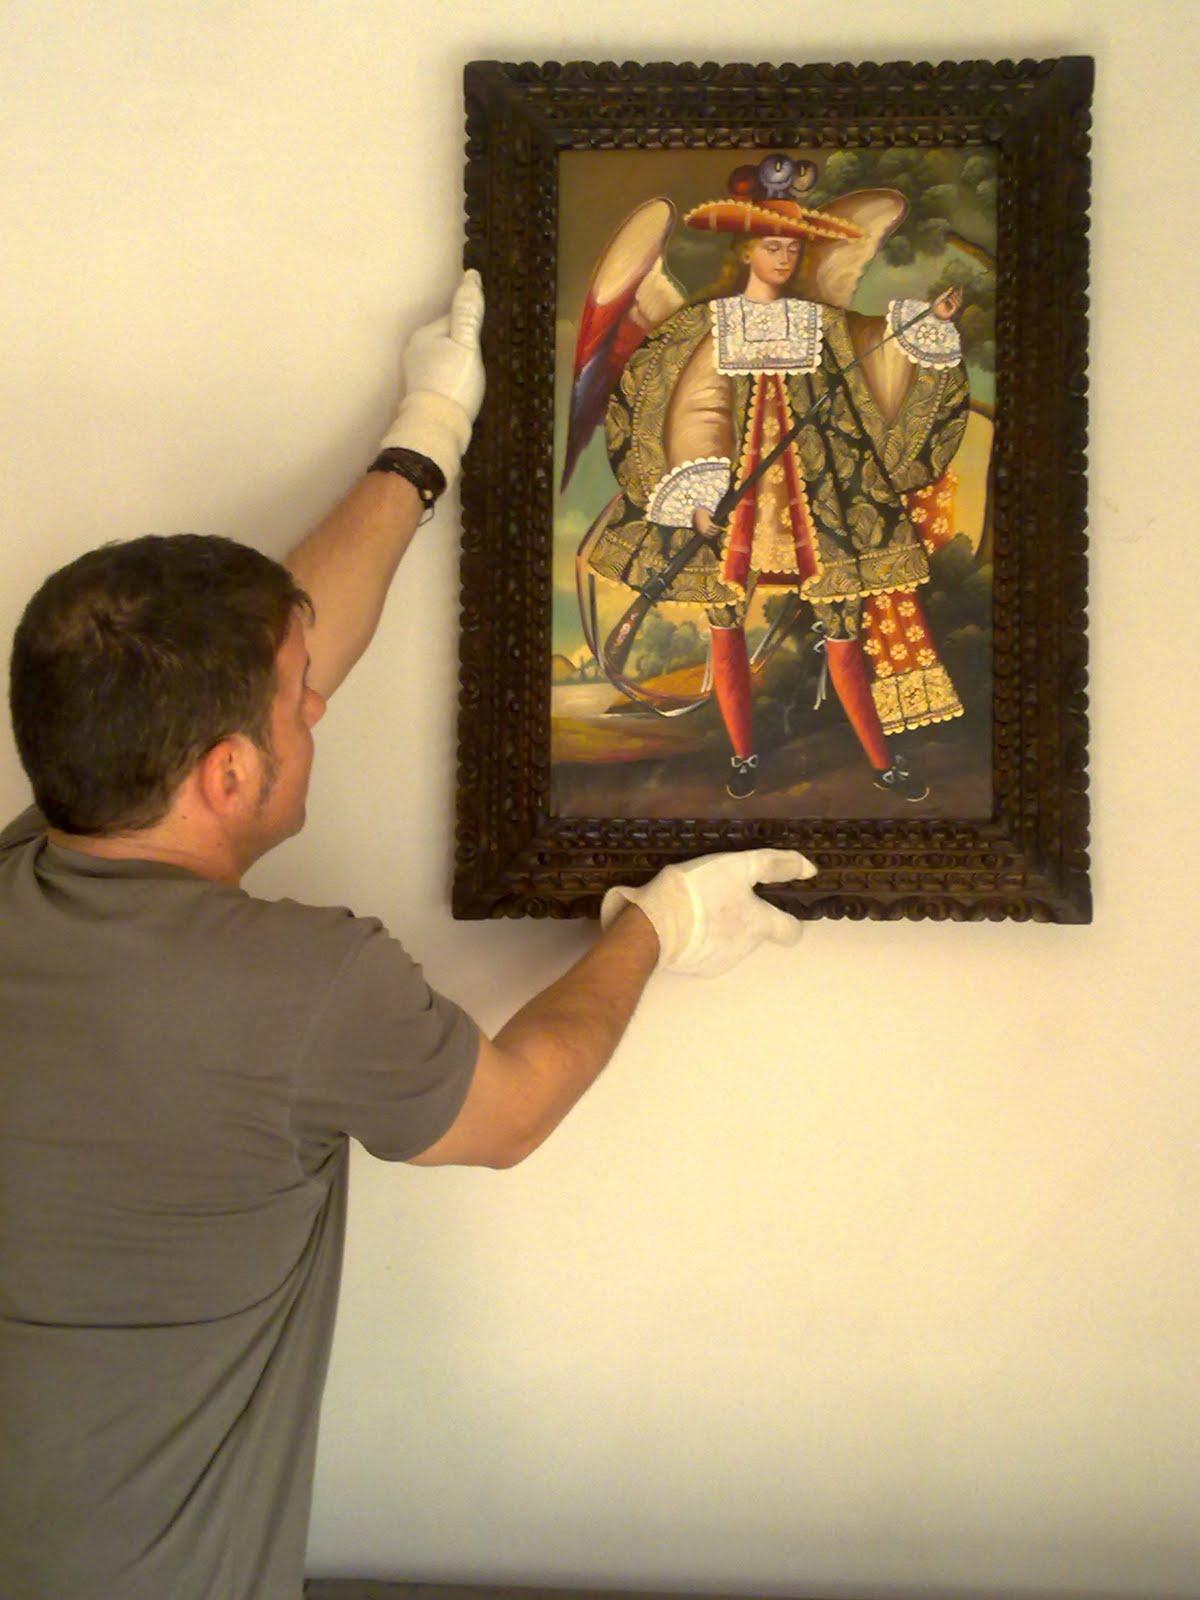 Antonio espias montaje de exposiciones - Empresas de montaje ...